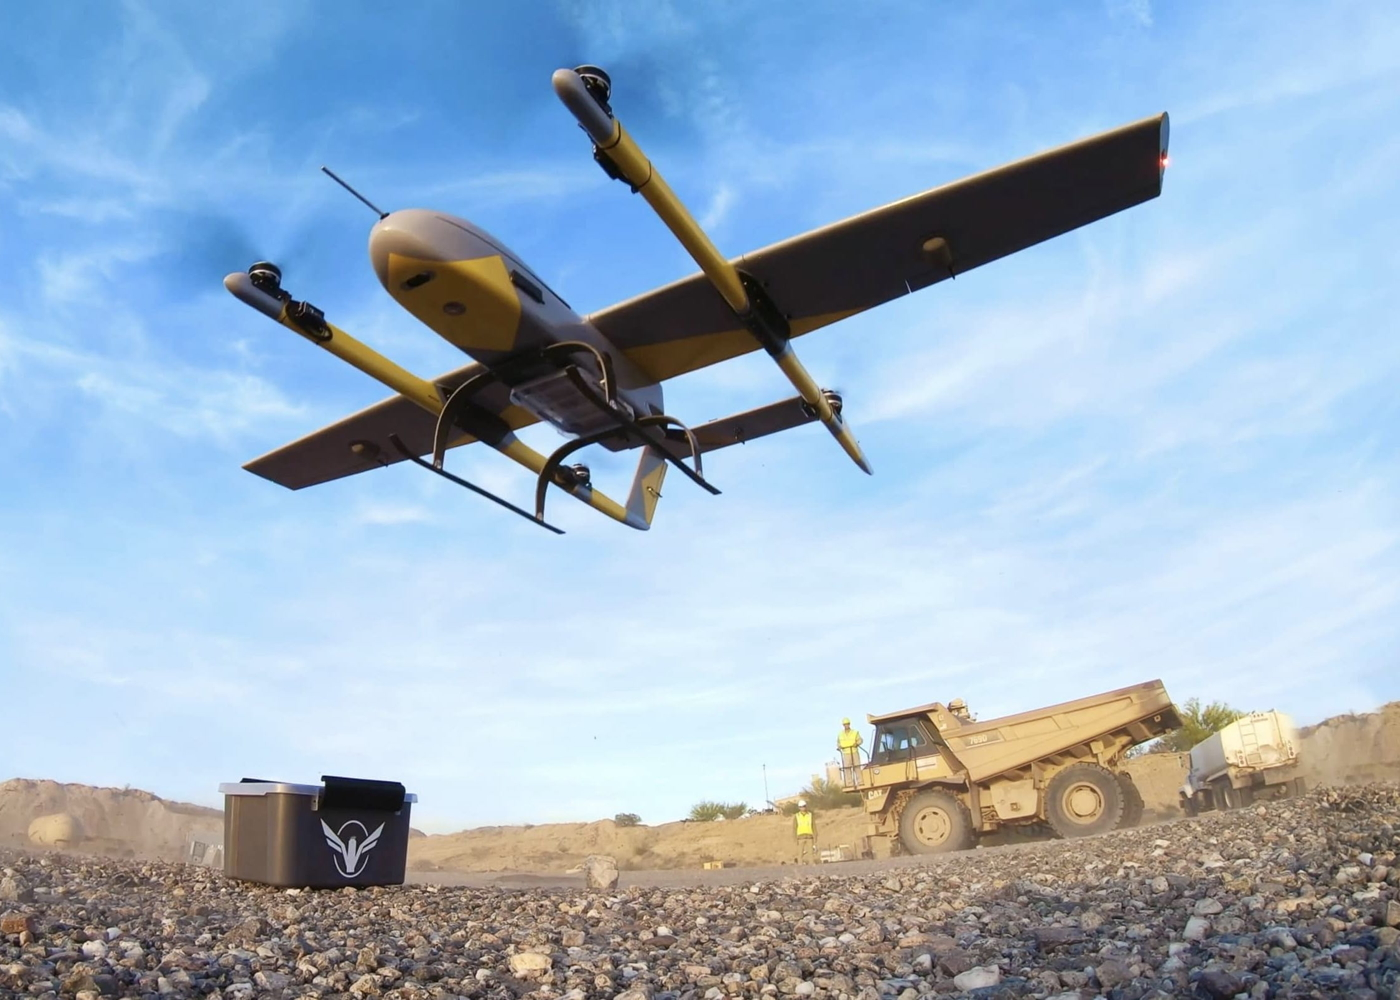 Volansi VOLY C10 drone